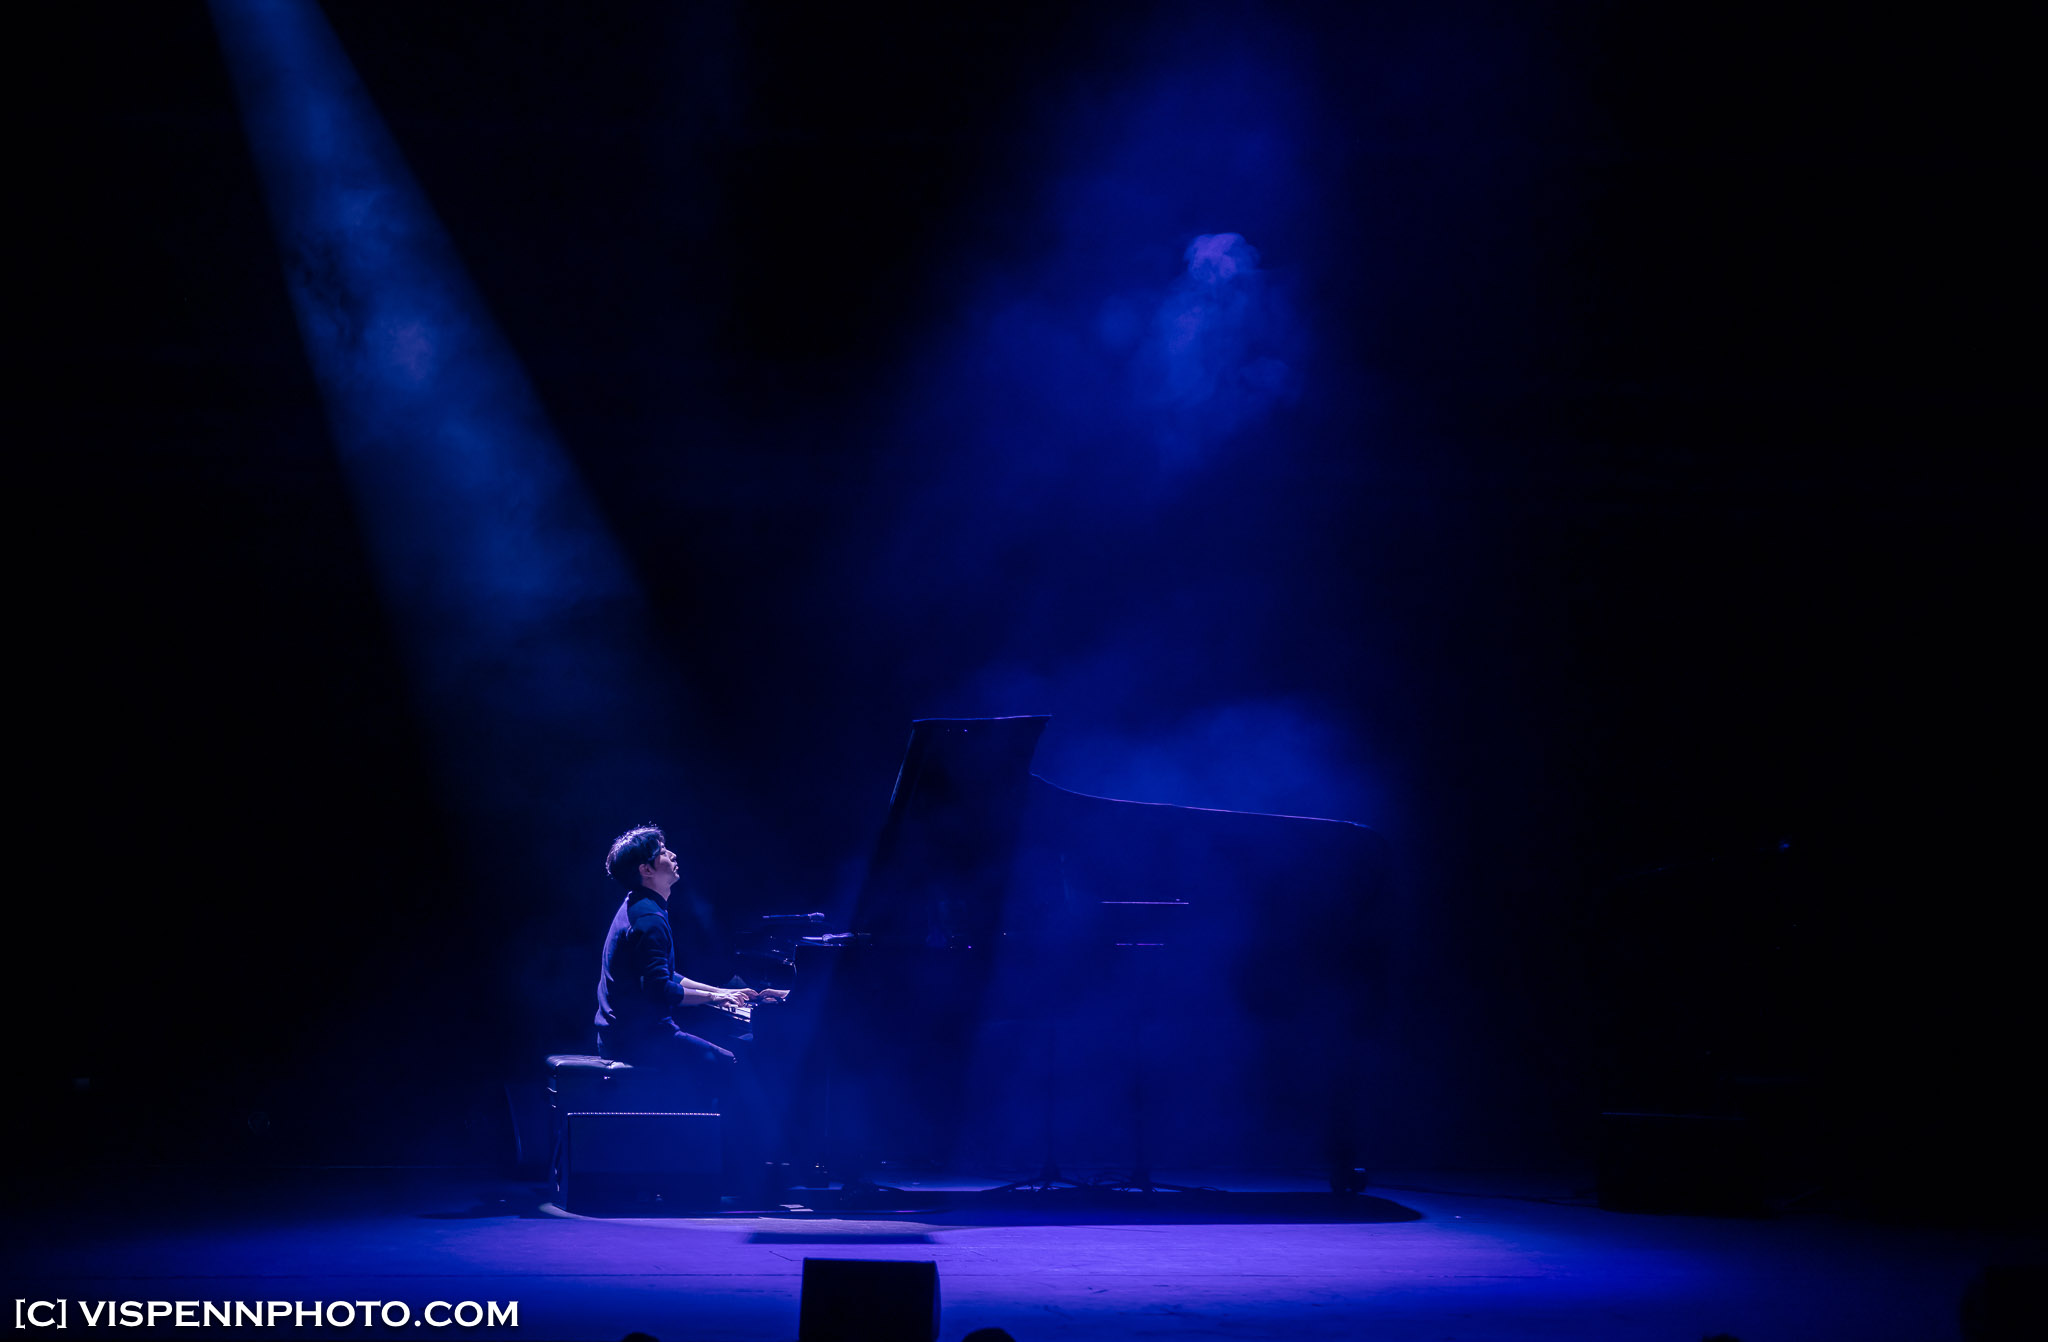 Melbourne CONCERTS Photography 墨尔本 演唱会 照片 摄影师 VISPENN YirumaMel 3P 0292 EOSR VISPENN